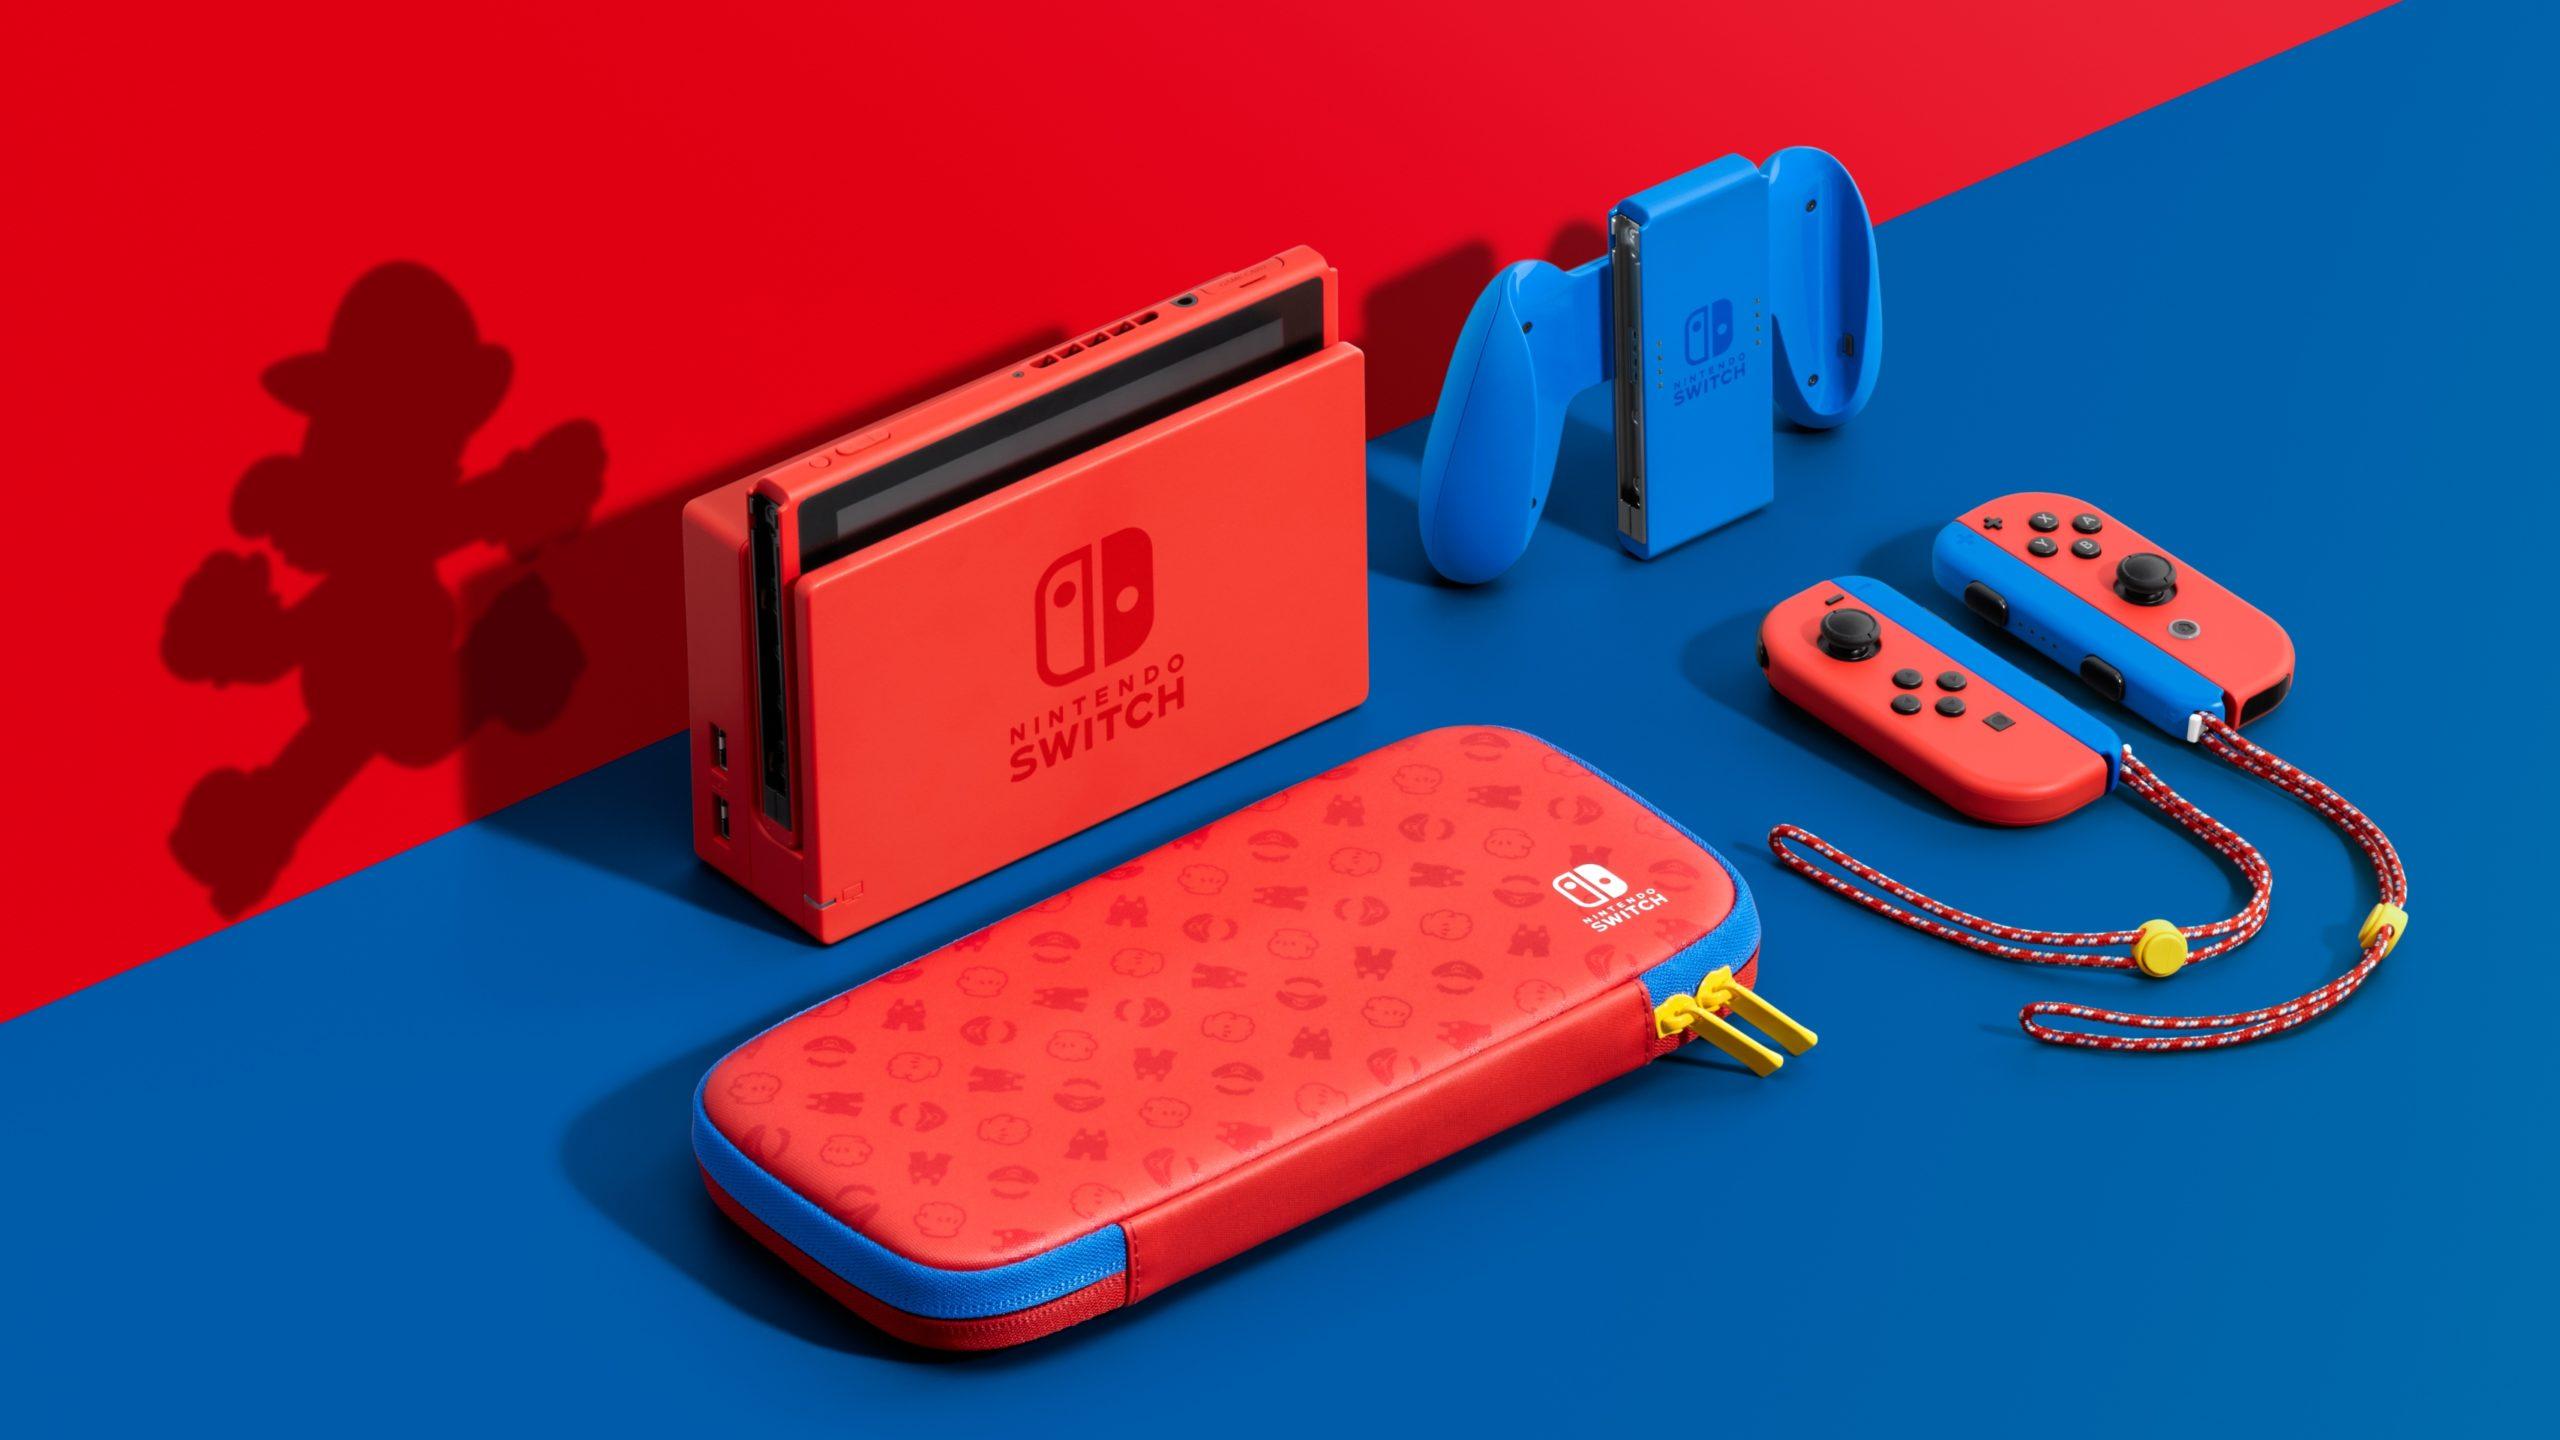 Super Mario 3D World + Bowser's Fury s novým Switchem [Update] Super Mario 3D World Plus Bowsers Fury 2021 01 12 21 003 scaled